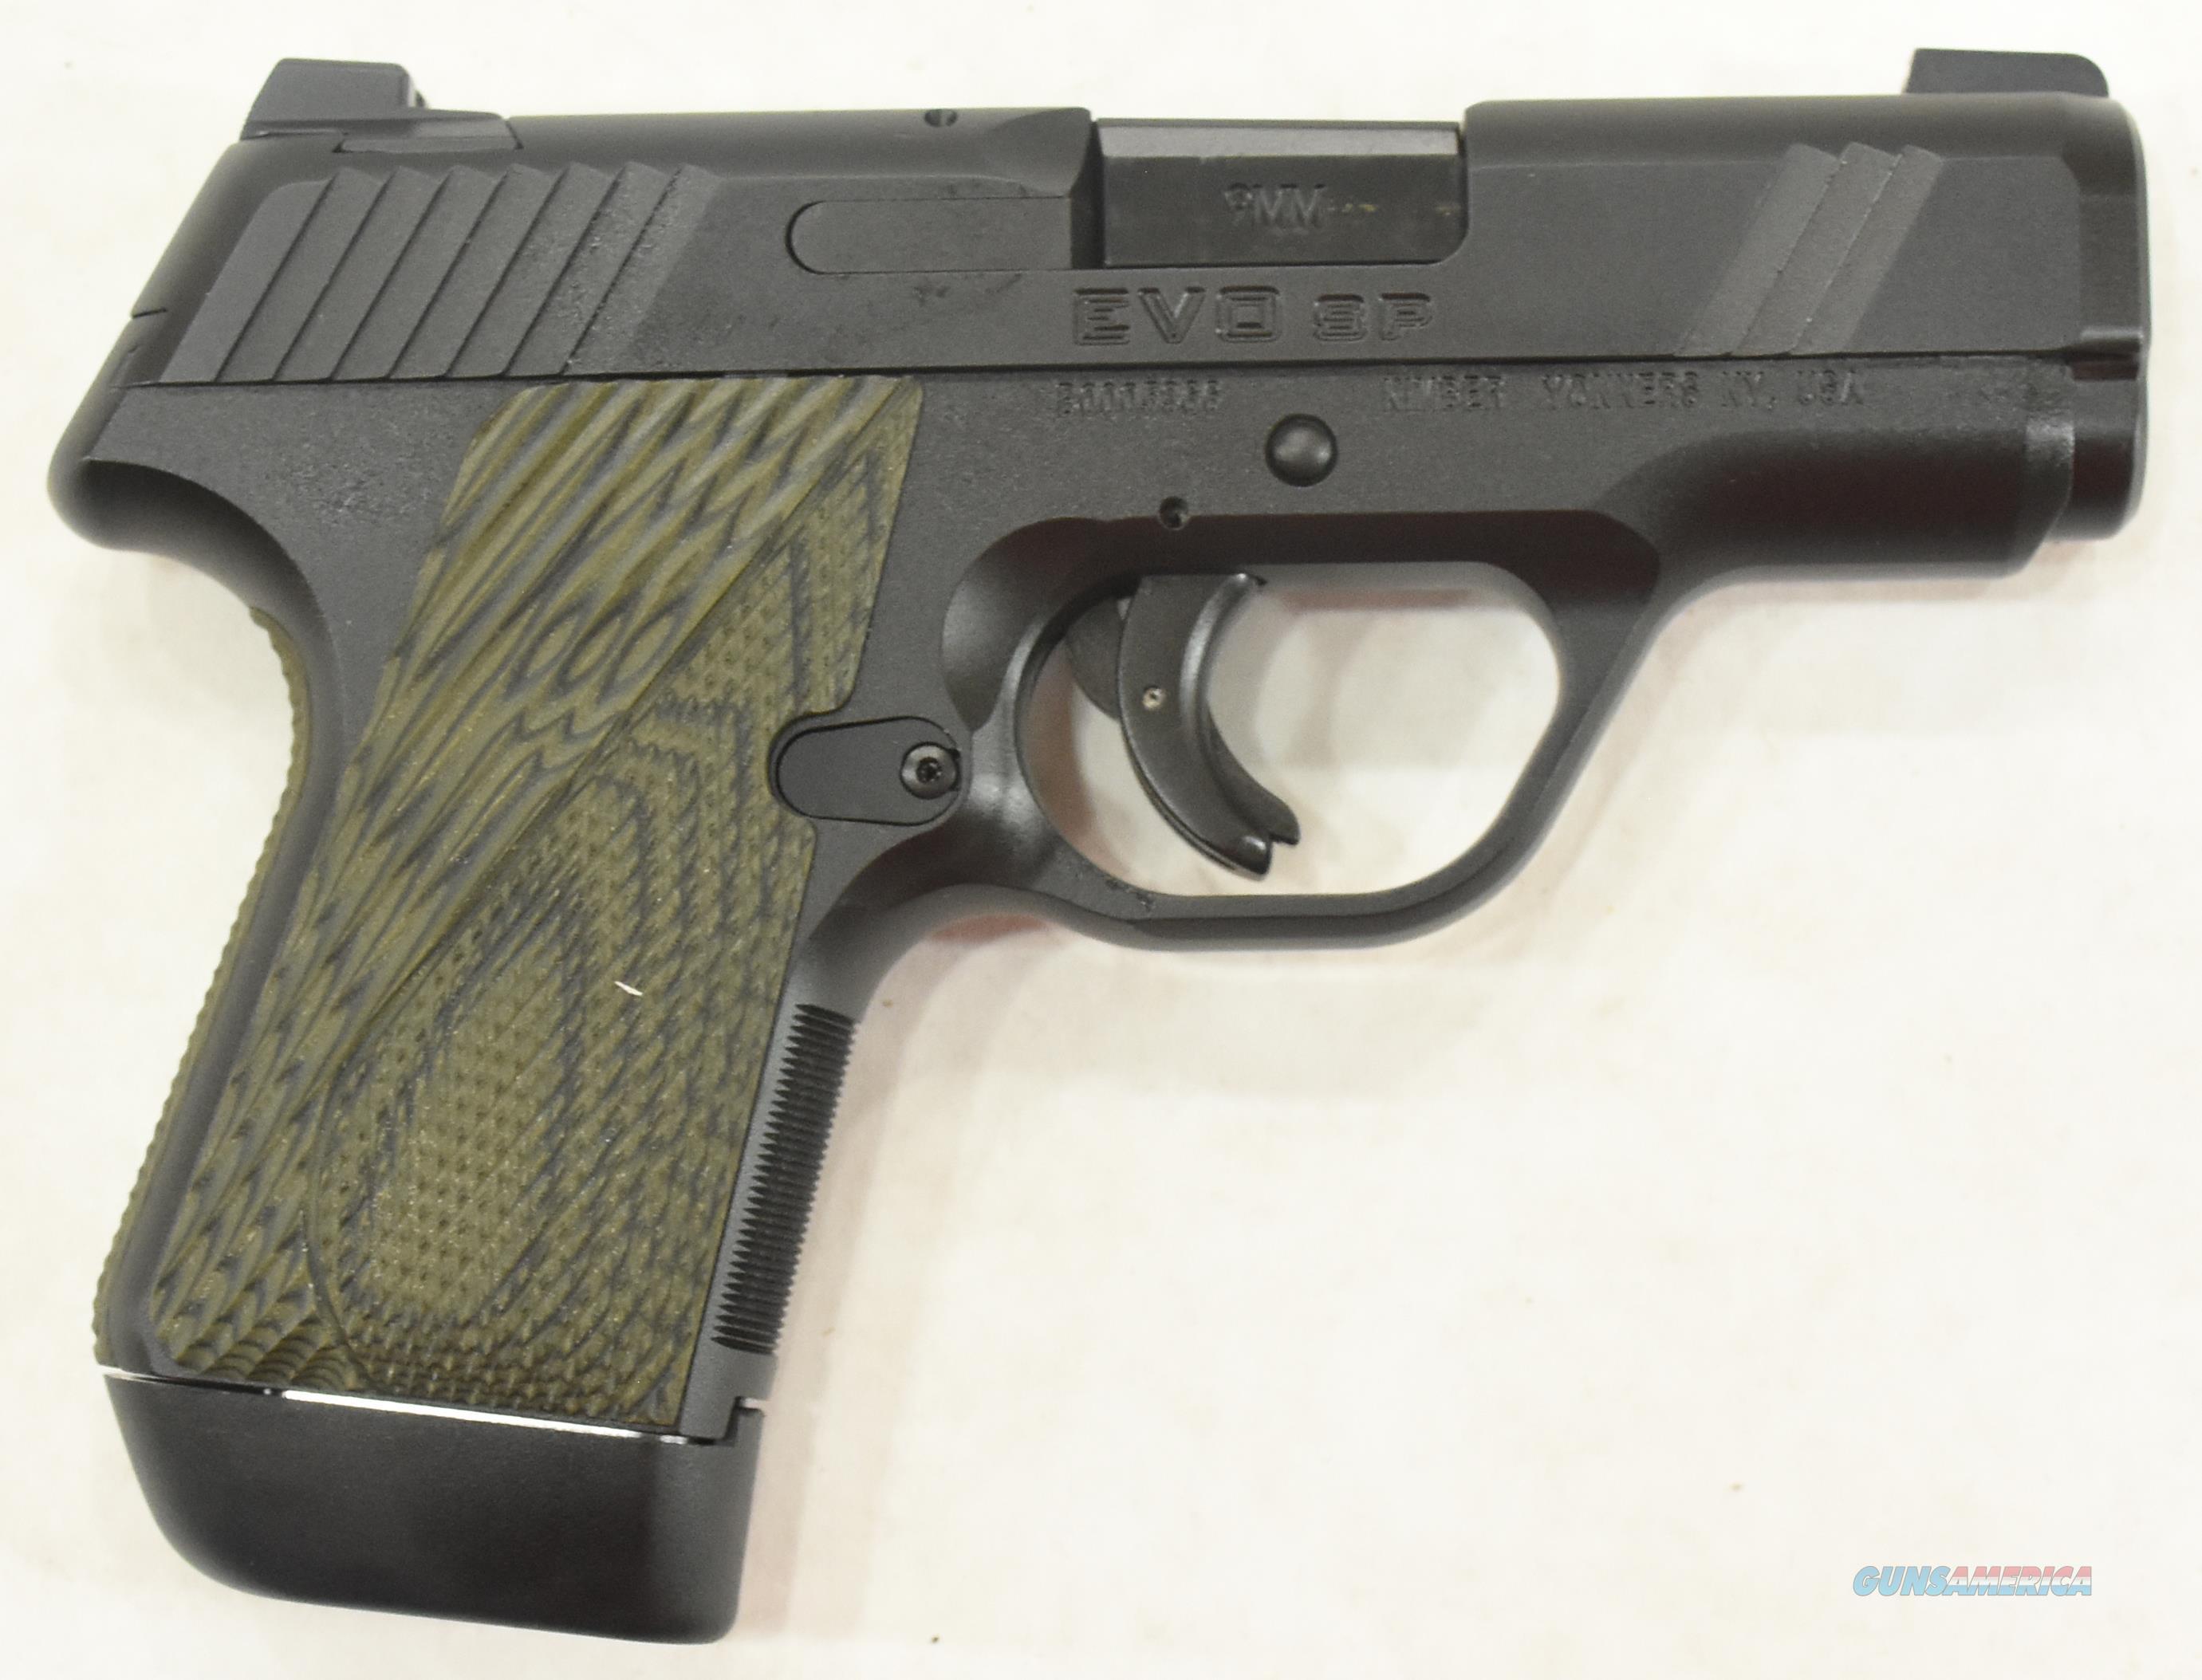 EVO SP TLE Nights 9mm 3.16In  3000012  Guns